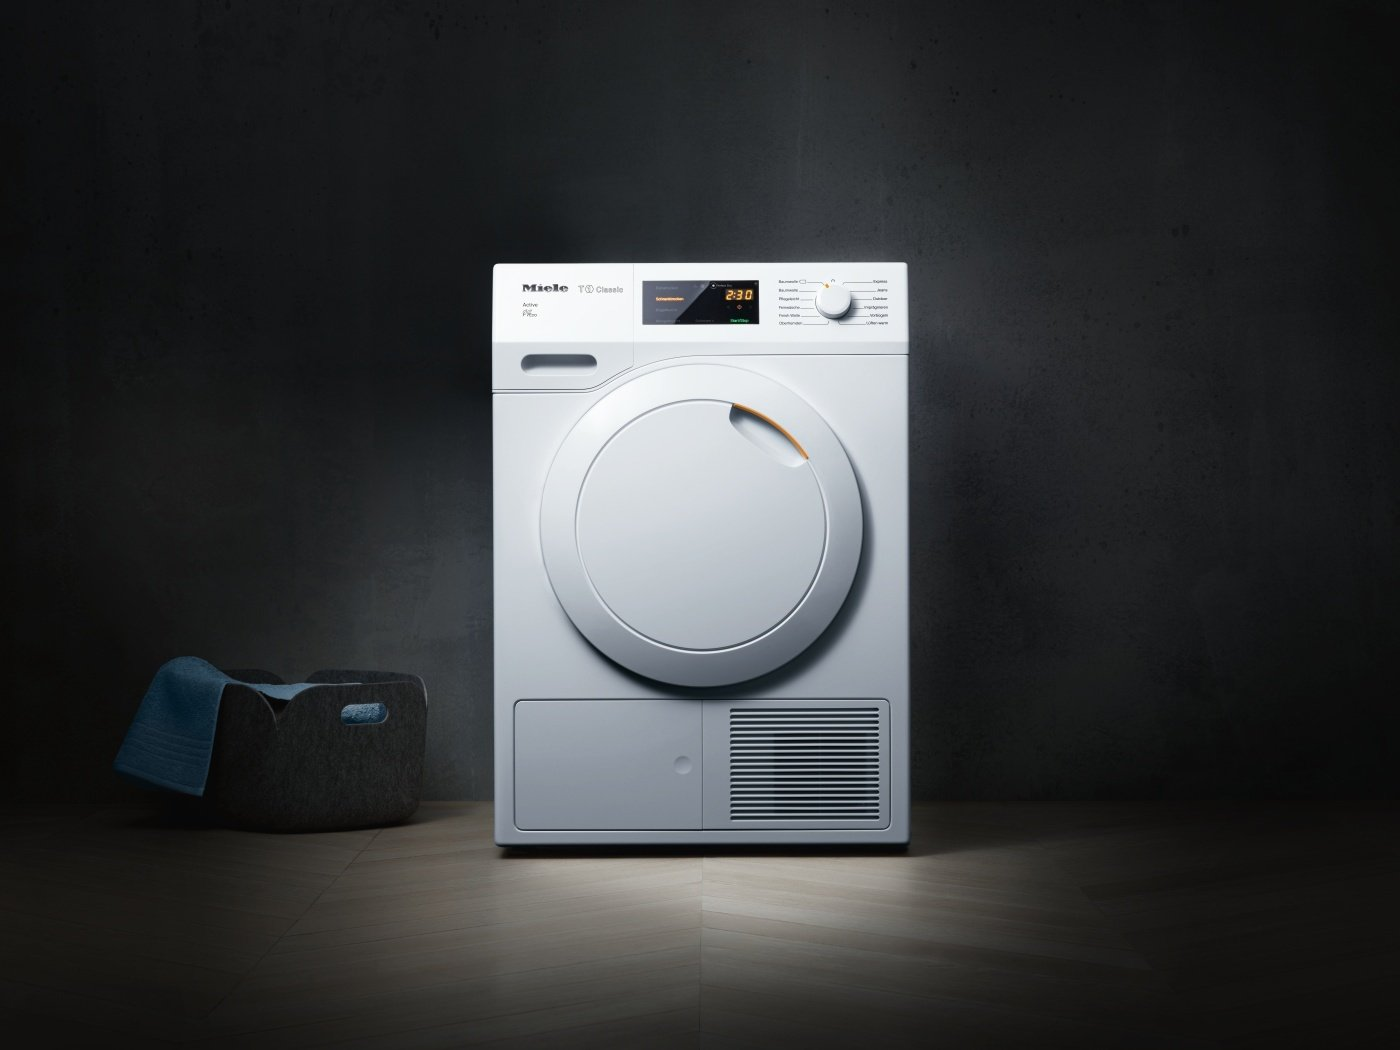 Miele tdb wp active wärmepumpentrockner mit geringem